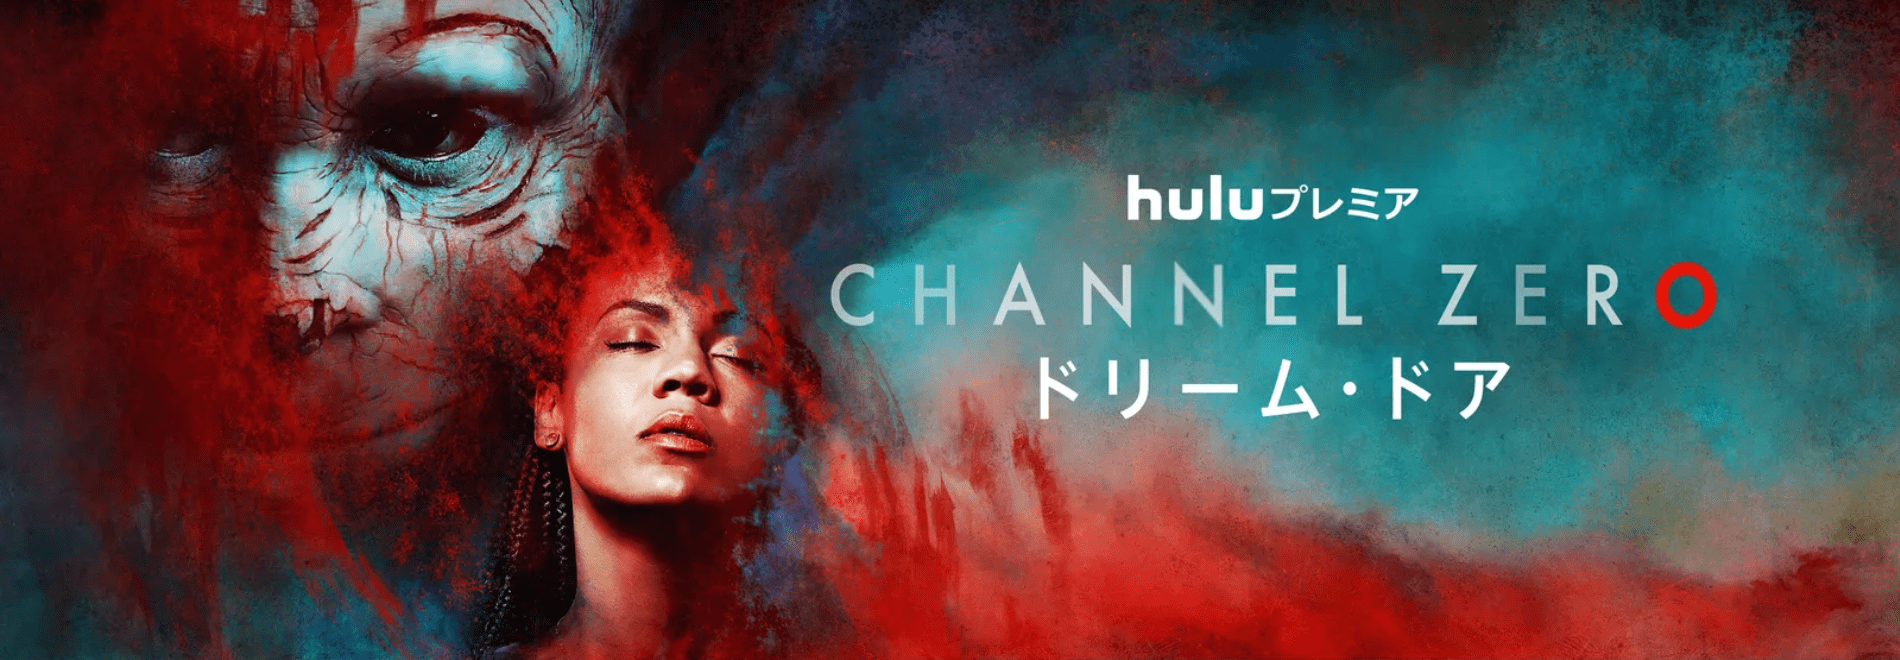 【Huluおすすめ作品まとめ】Hulu6万本の見放題作品の中からおすすめタイトルを厳選!フールーのおすすめ動画ラインナップをご紹介|最新のHulu動画ラインナップ:Channel ZERO:ドリーム・ドア